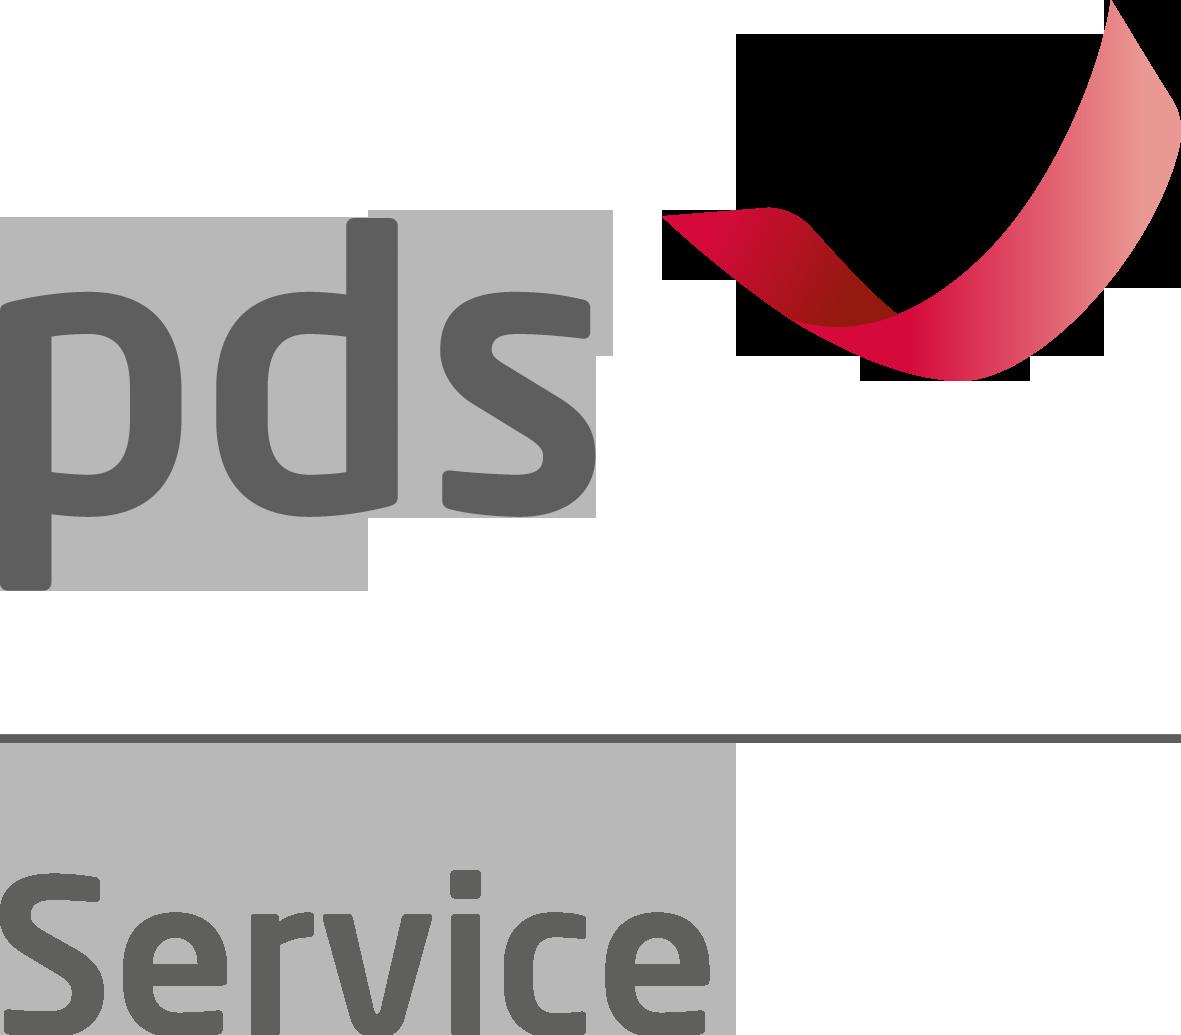 pds_Service_Logo